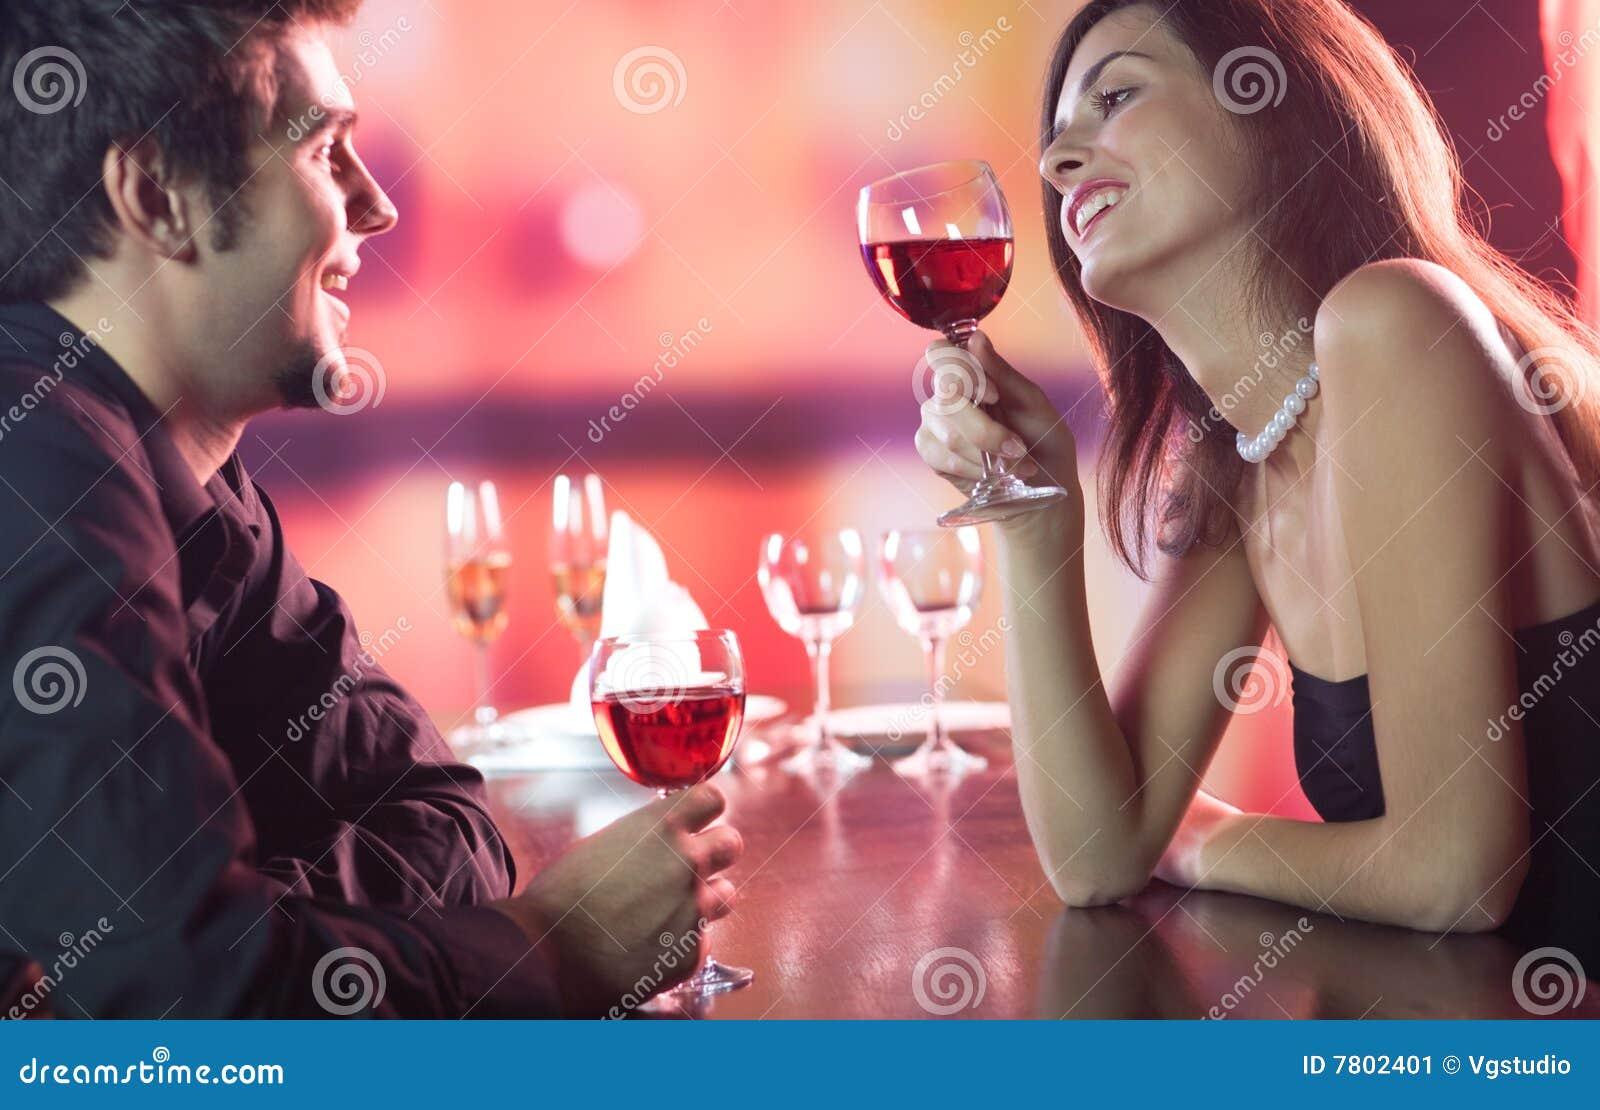 празднующ пар совместно